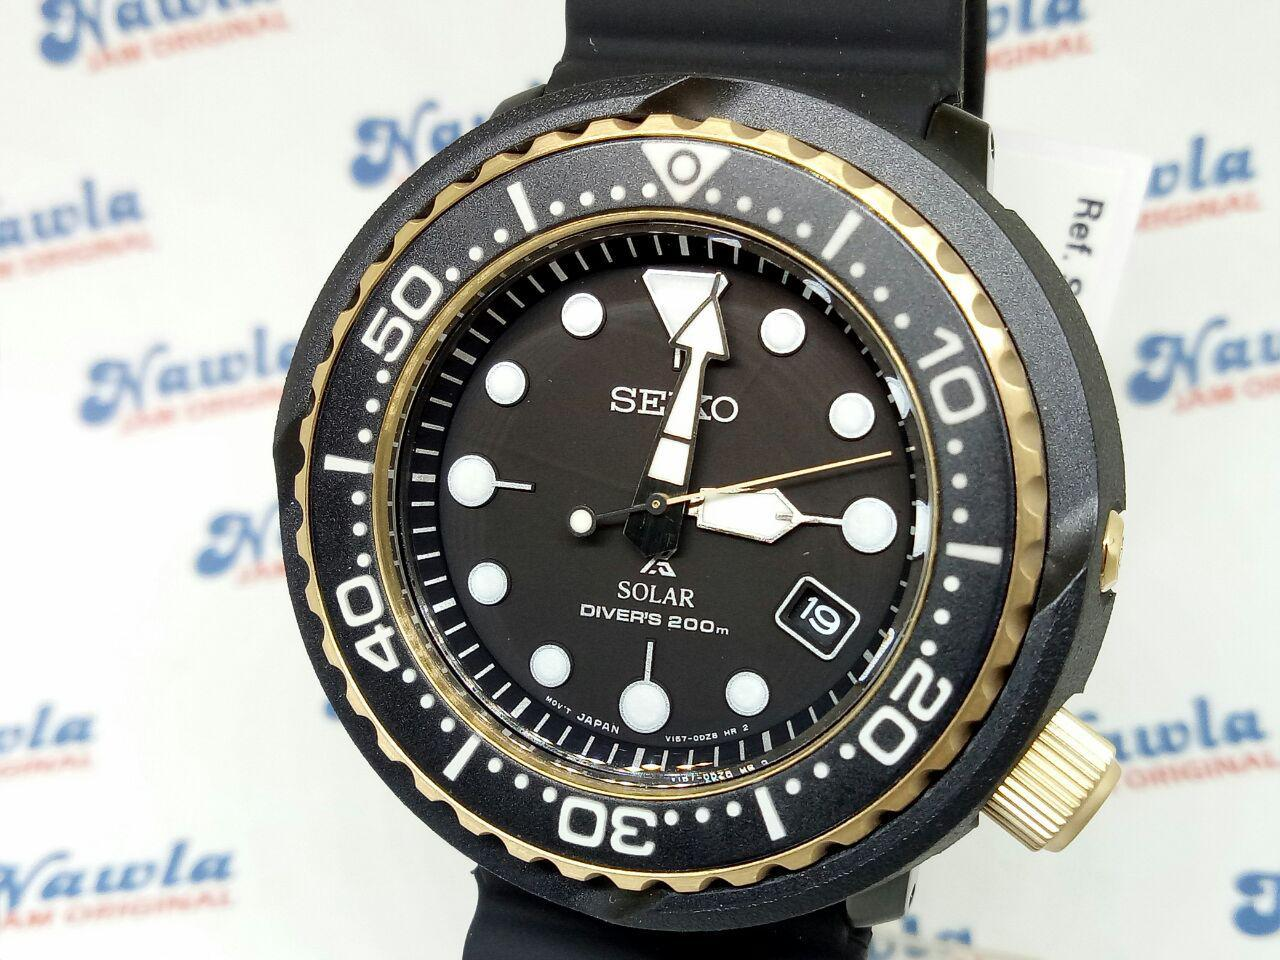 Fitur Seiko Prospex Sne498p1 Solar Tuna Black Gold Jam Tangan Pria Ssc347p1 Sky Chronograph Blue Dial Stainless Sne498 4